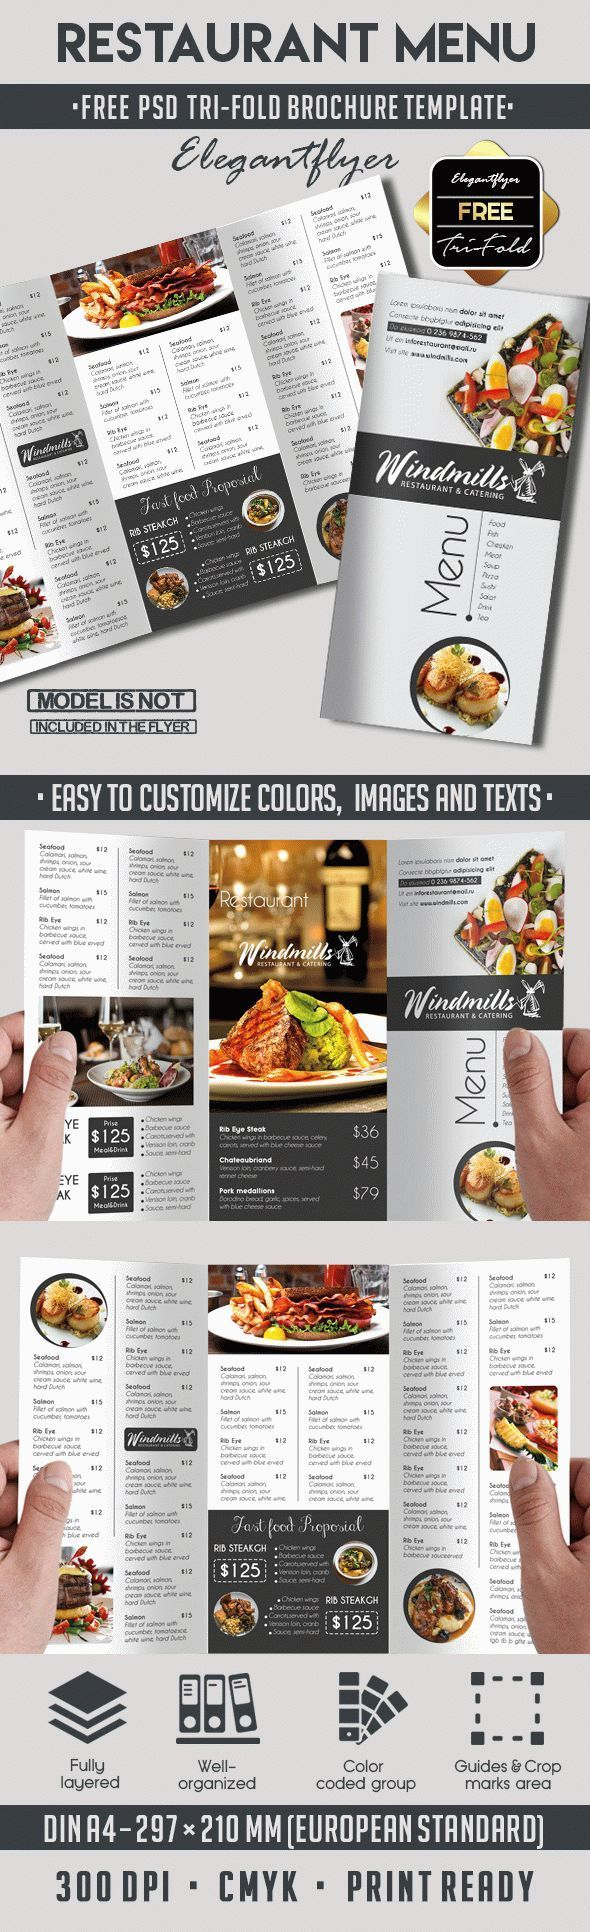 Restaurant Menu – Free PSD Tri-Fold PSD Brochure Template